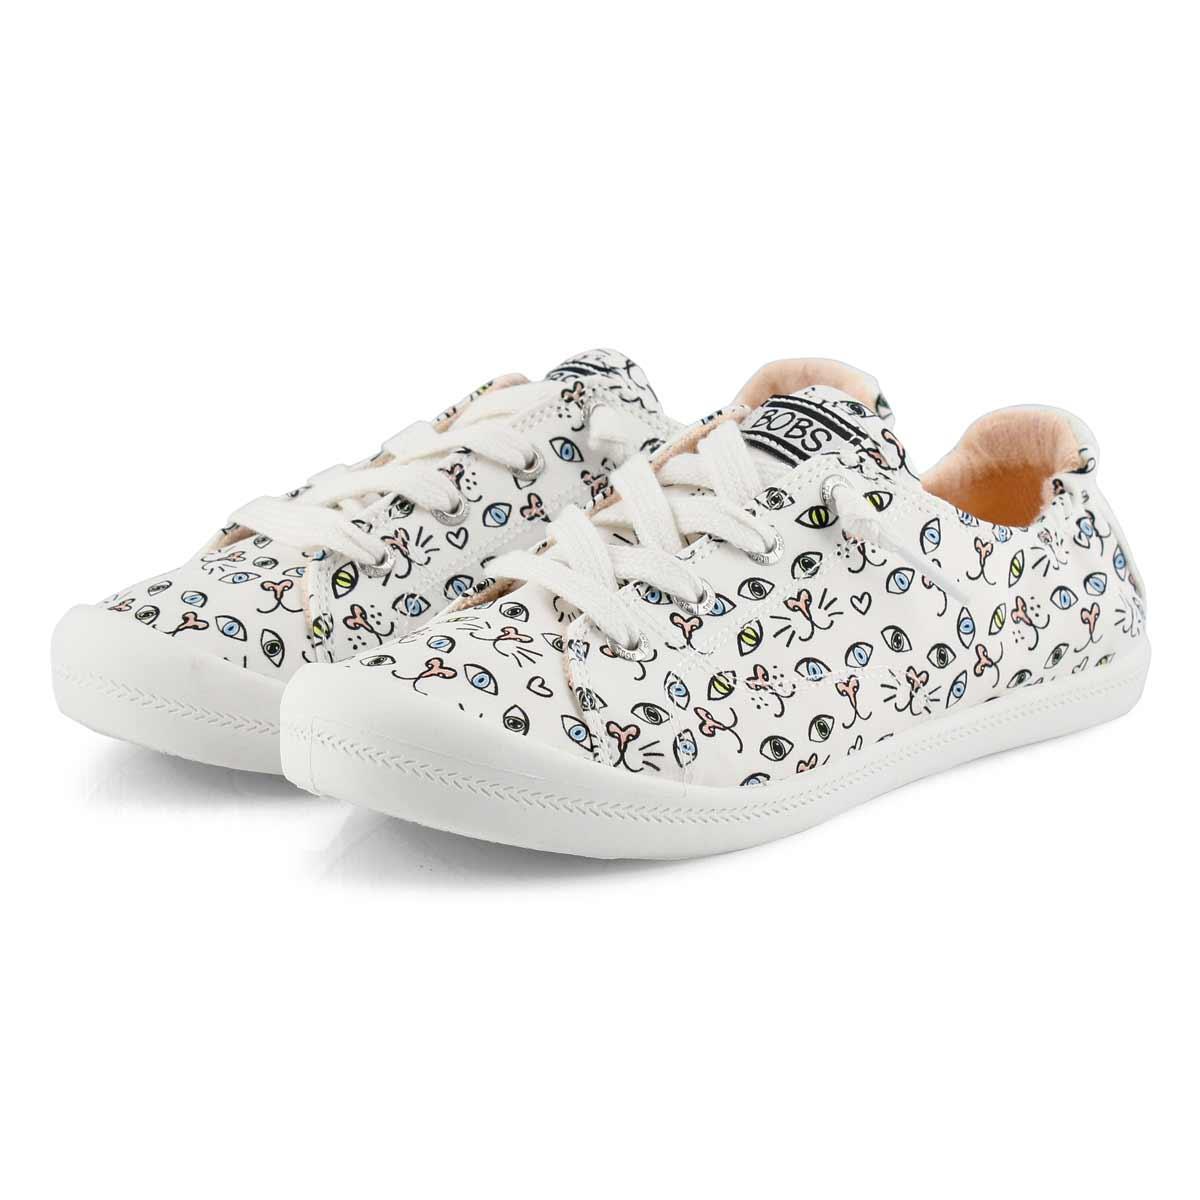 Women's Bobs Beach Bingo Sneaker - White/Multi